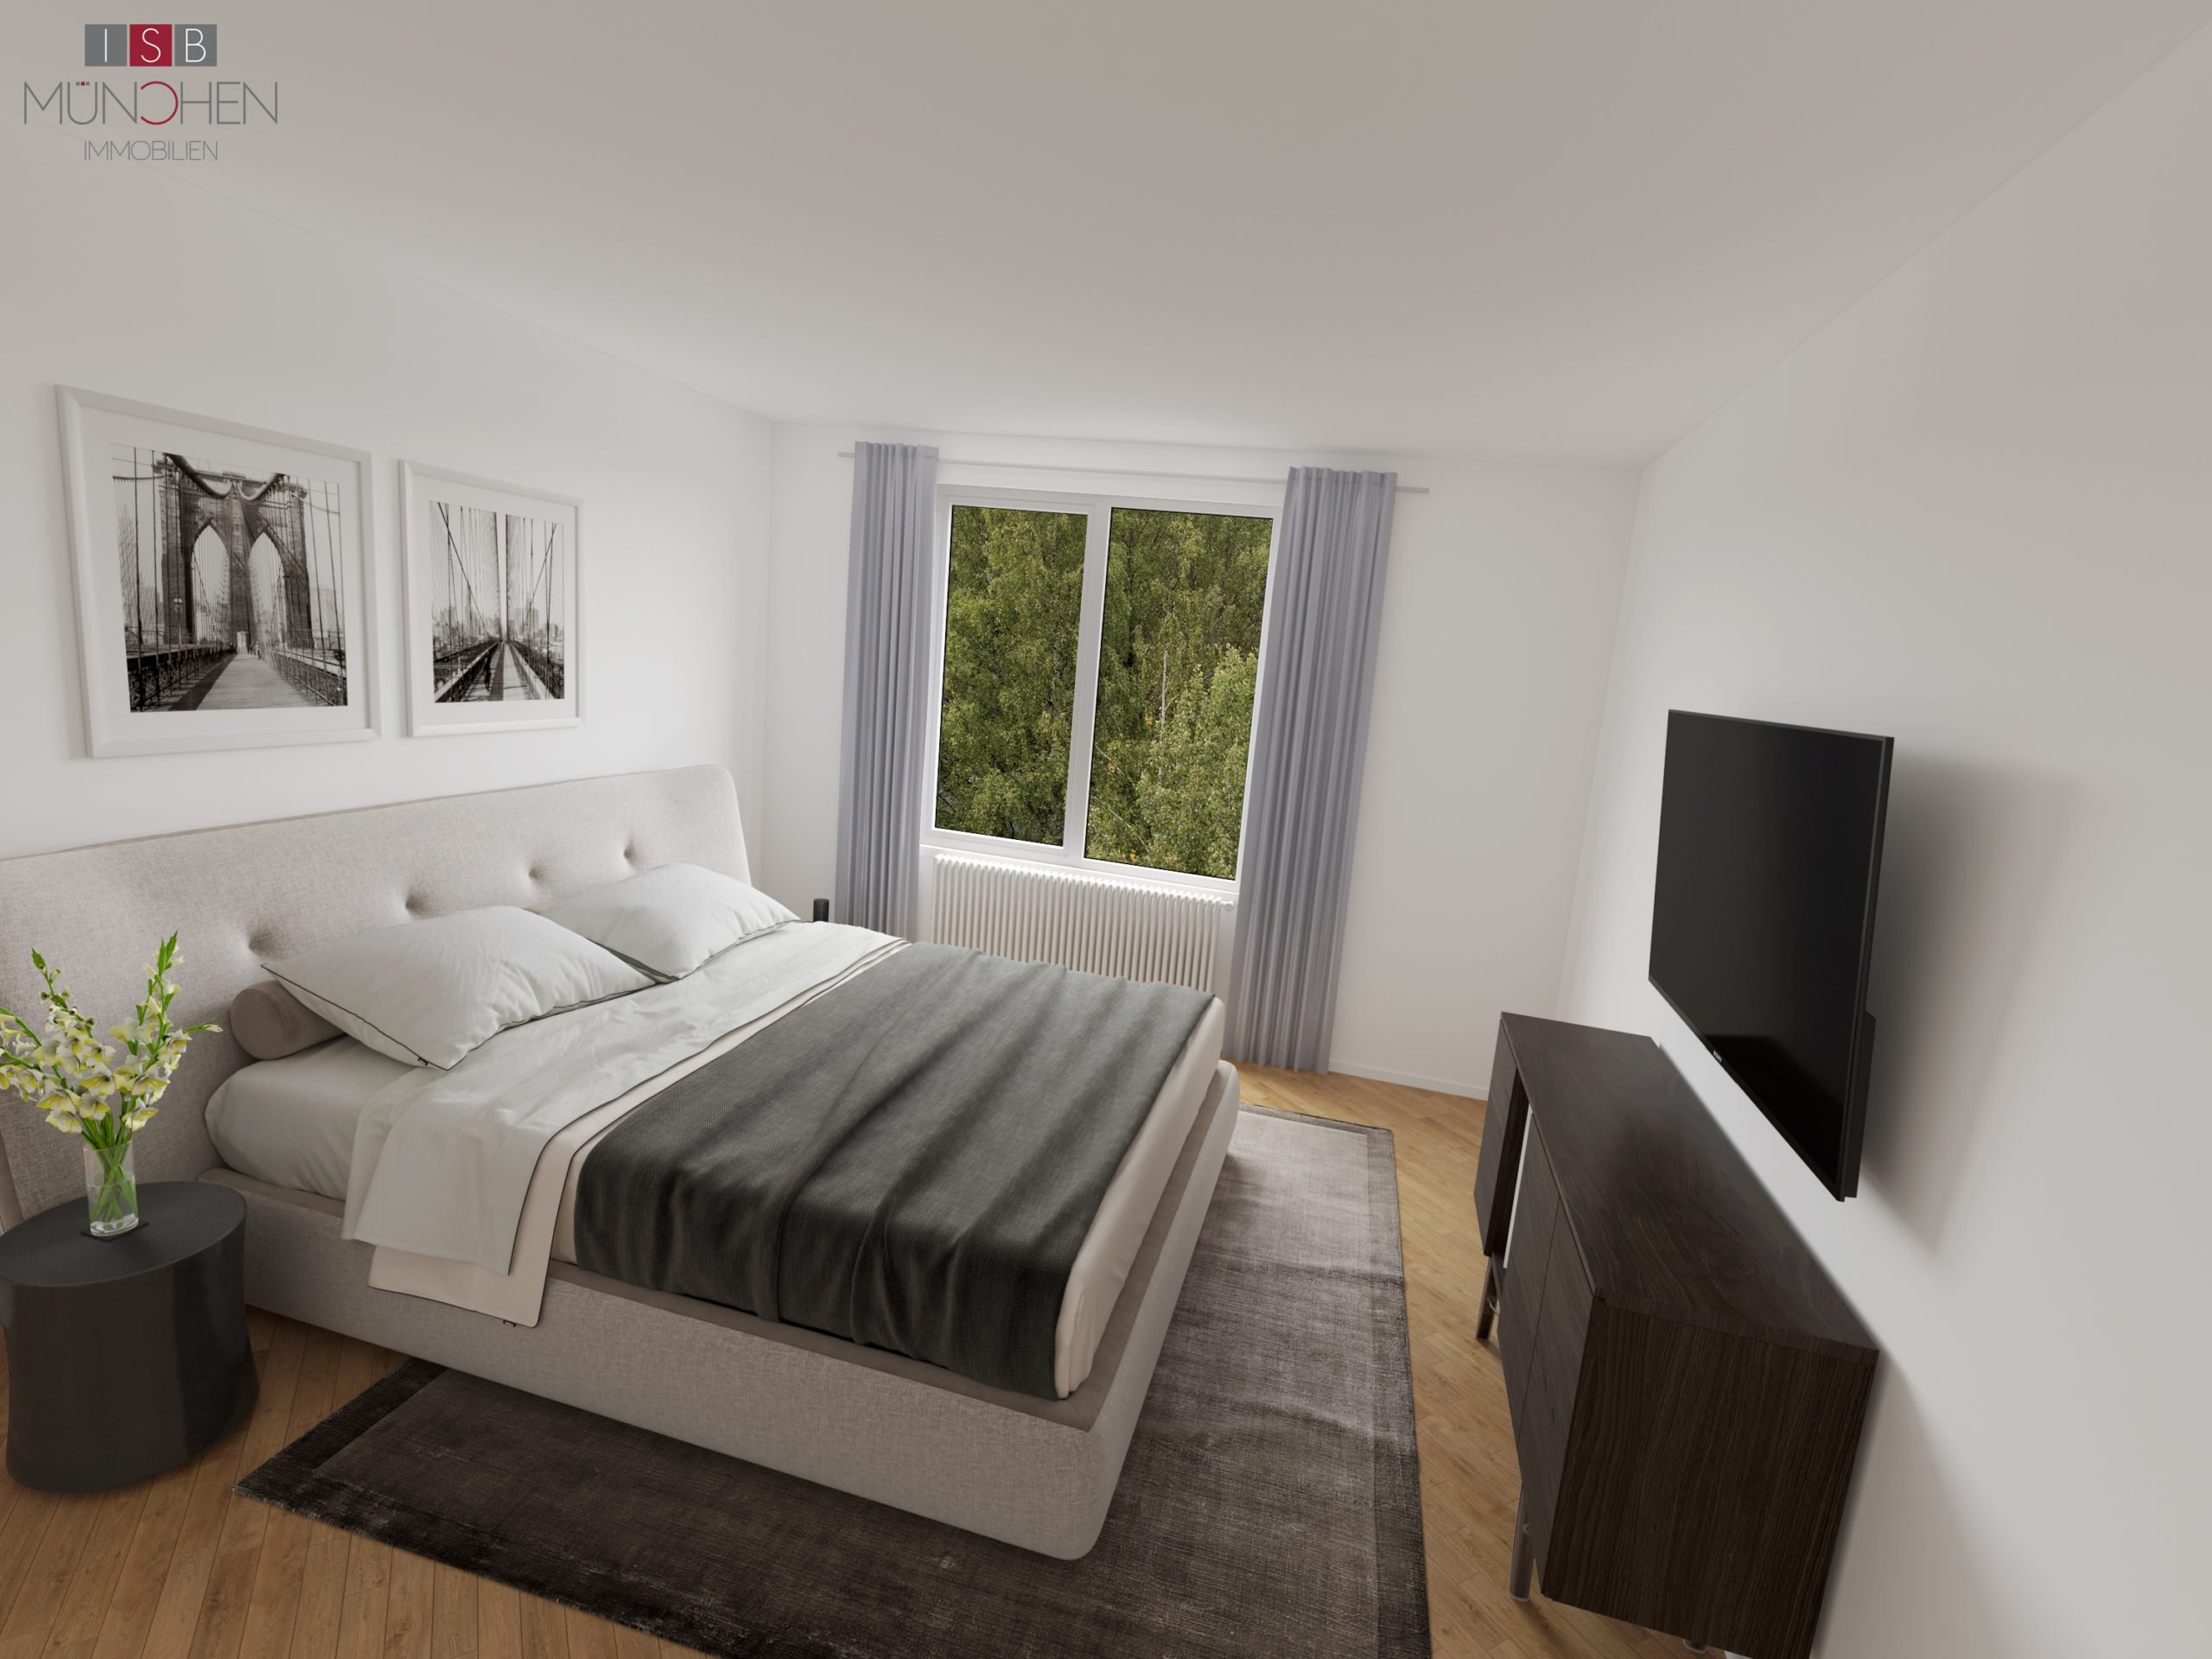 Schlafzimmer final04 scaled